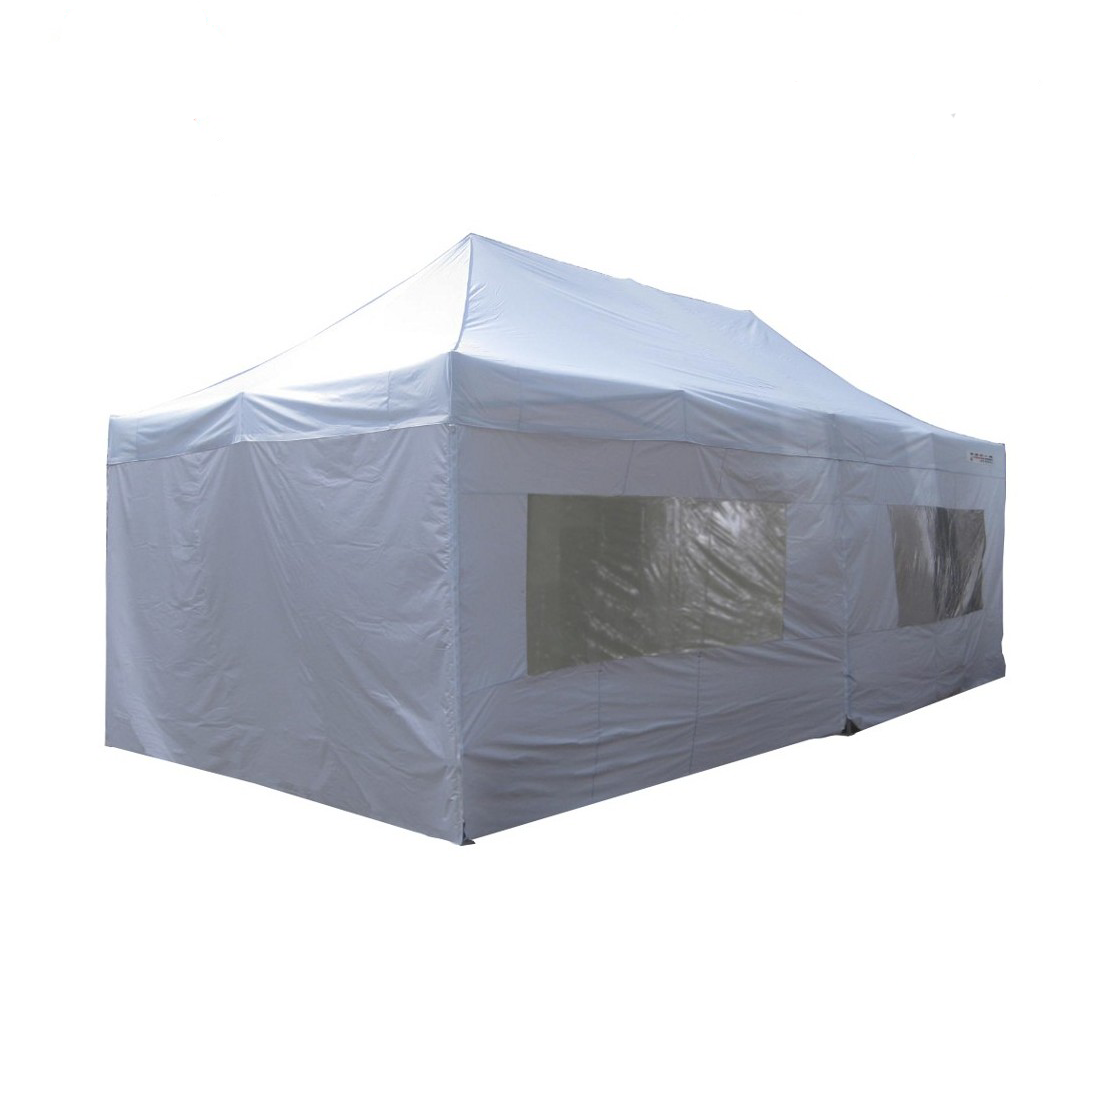 Tente 4x8m